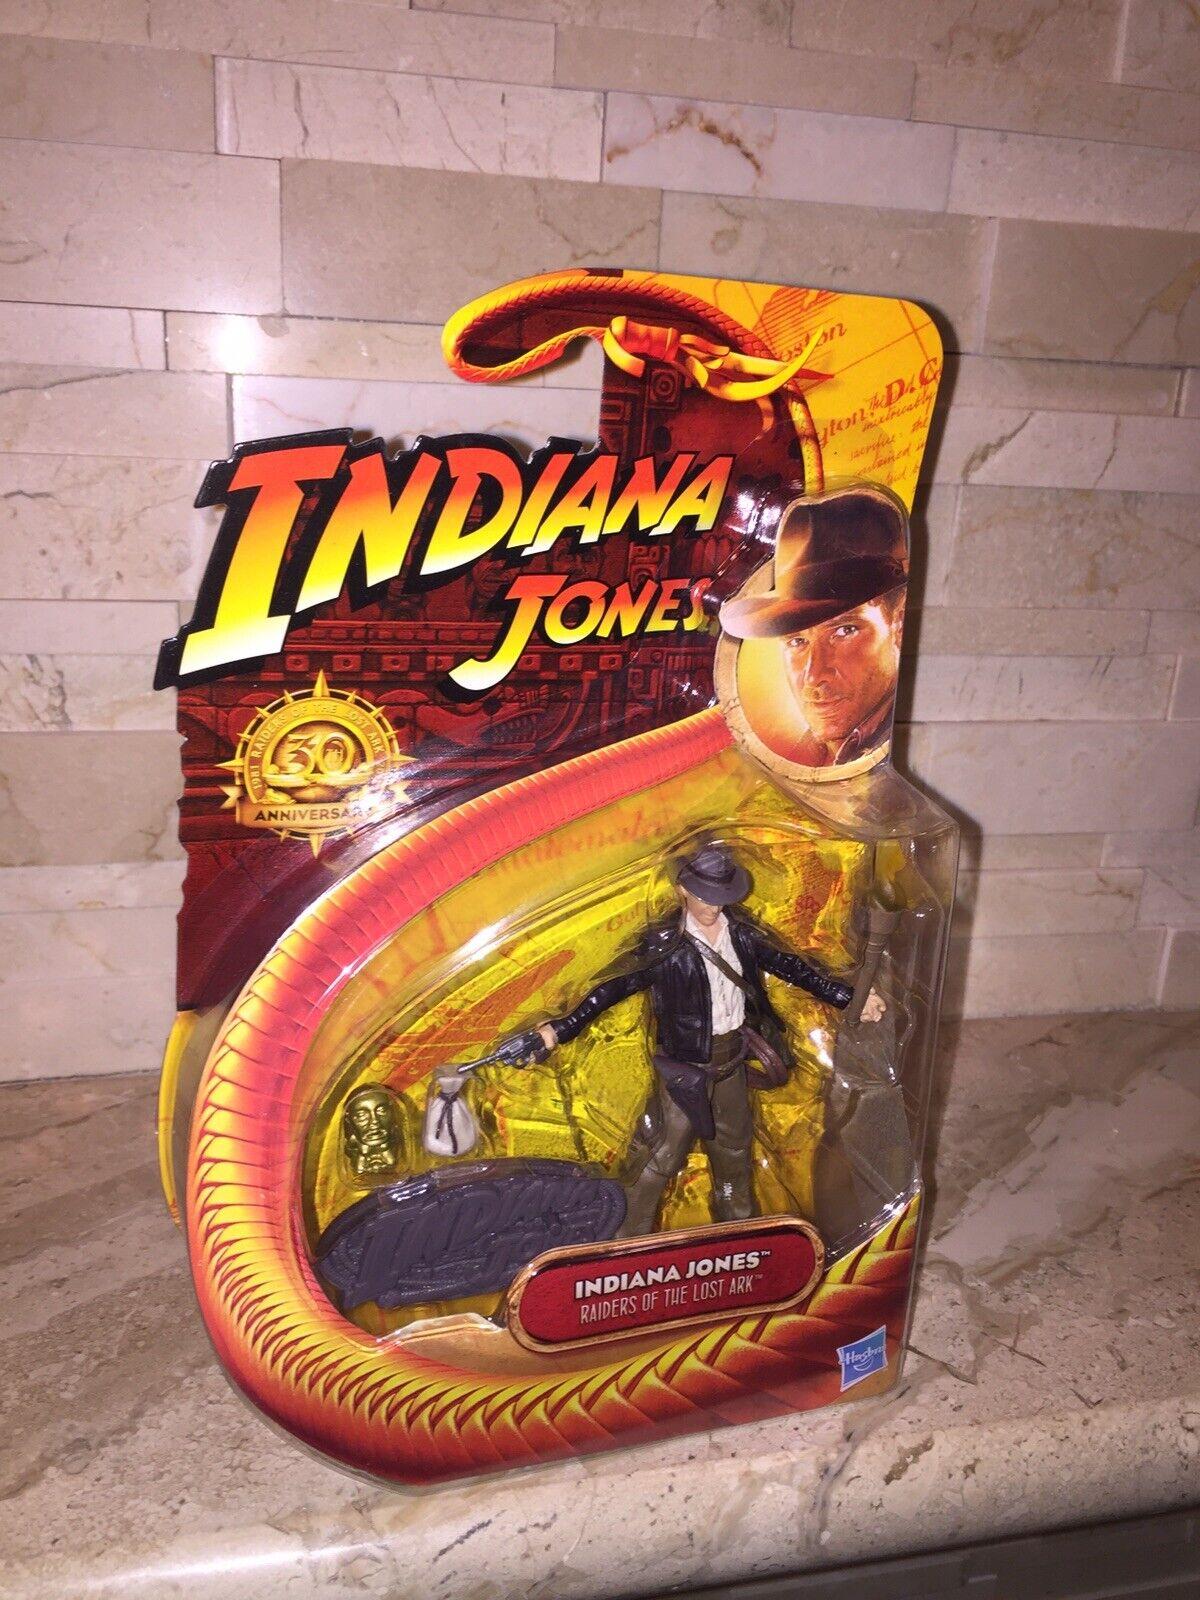 INDIANA JONES WITH TORCH  2011 COMIC CON EXCLUSIVE 30TH ANNIVERSARY FIGURE  voici la dernière